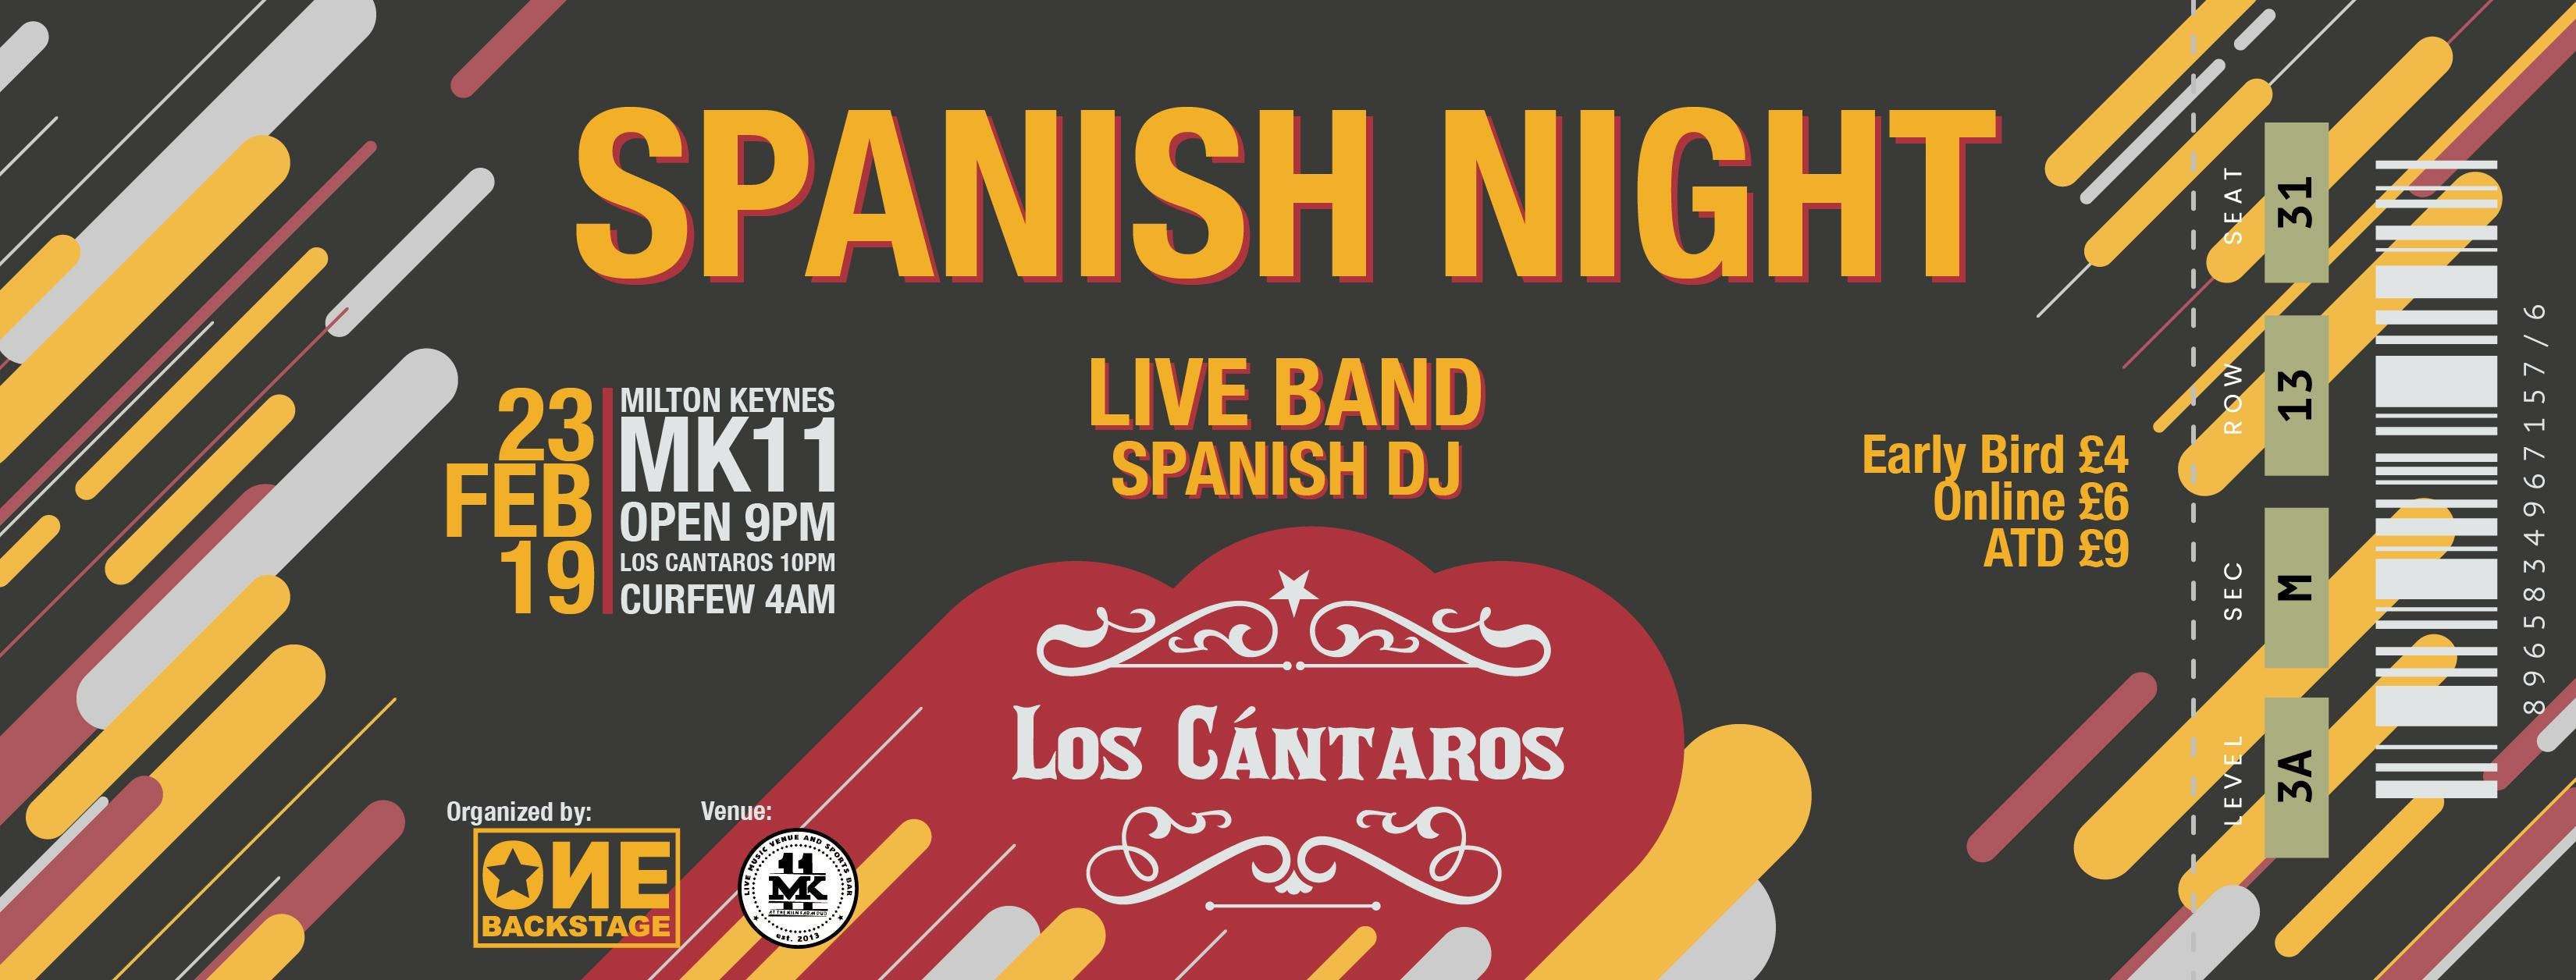 Spanish Night MK - Los Cantaros